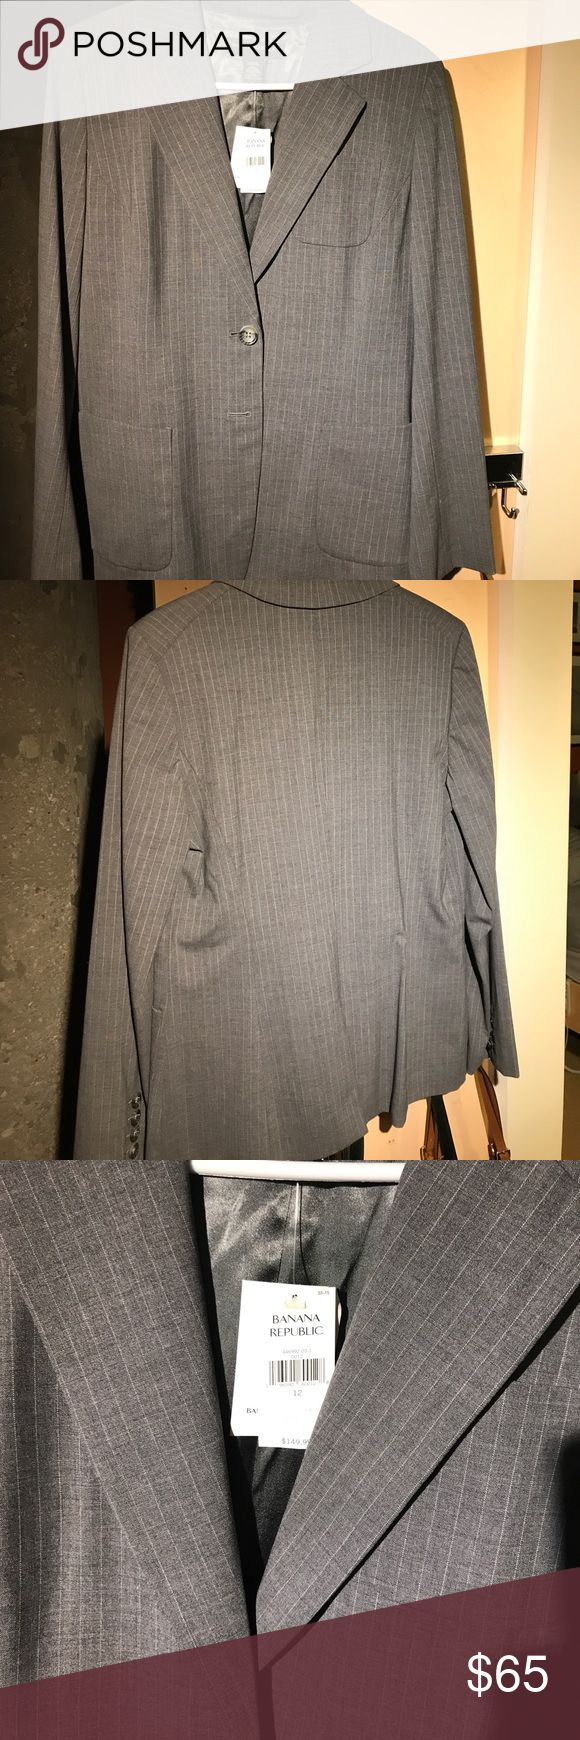 Women's Banana Republic Blazer Grey with small white pinstripe. Brand new, never been worn. Banana Republic Jackets & Coats Blazers